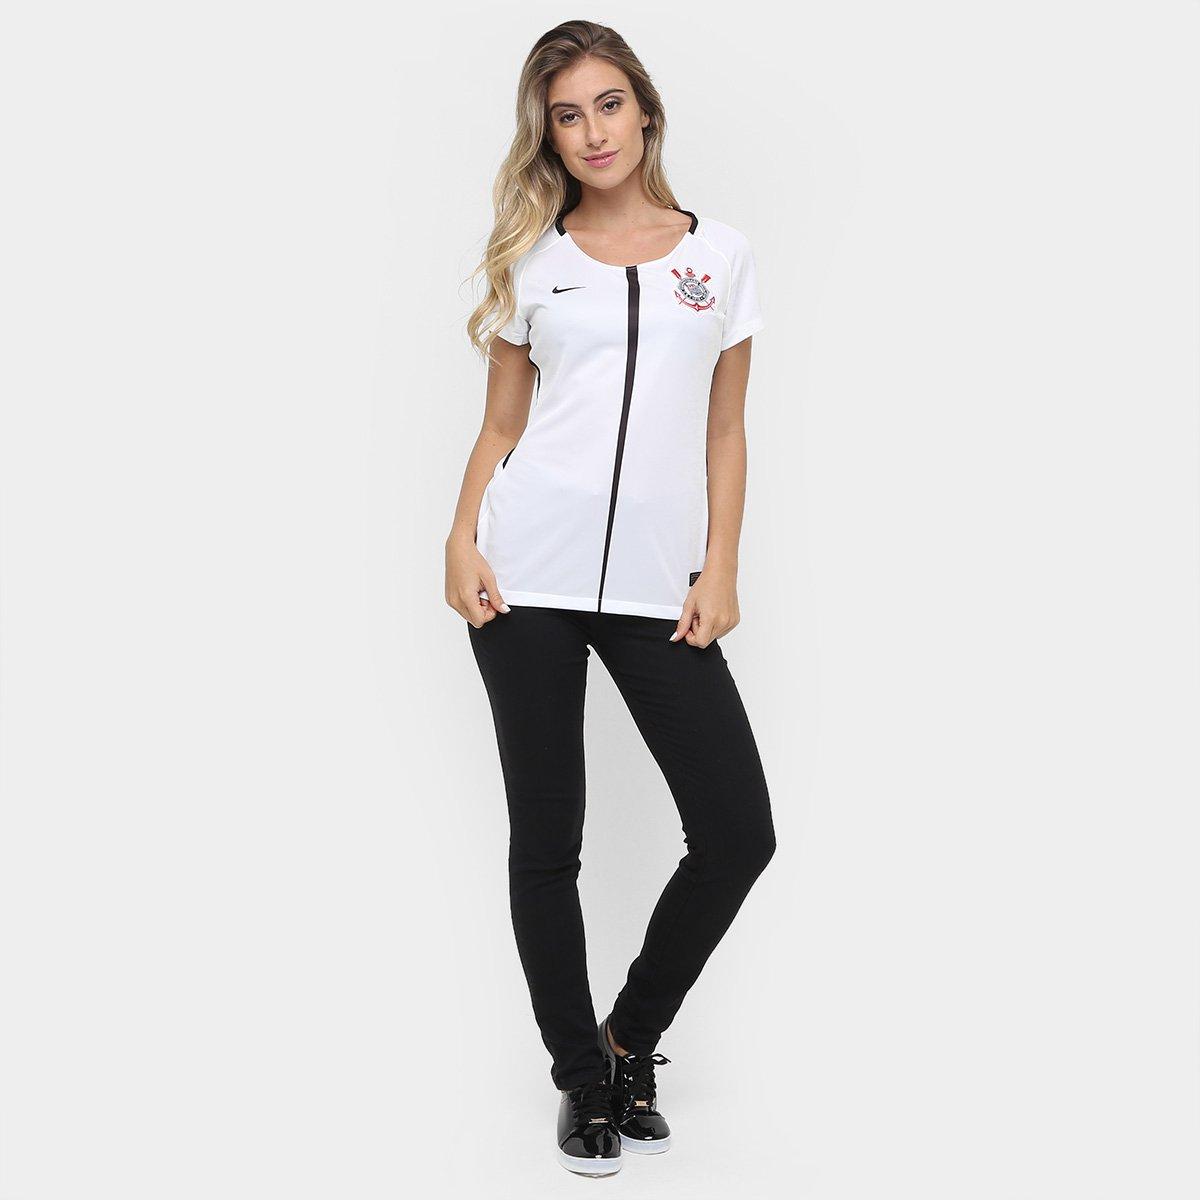 52386aac3c Camisa Corinthians I 17 18 s nº Torcedor Nike Feminina - Compre ...